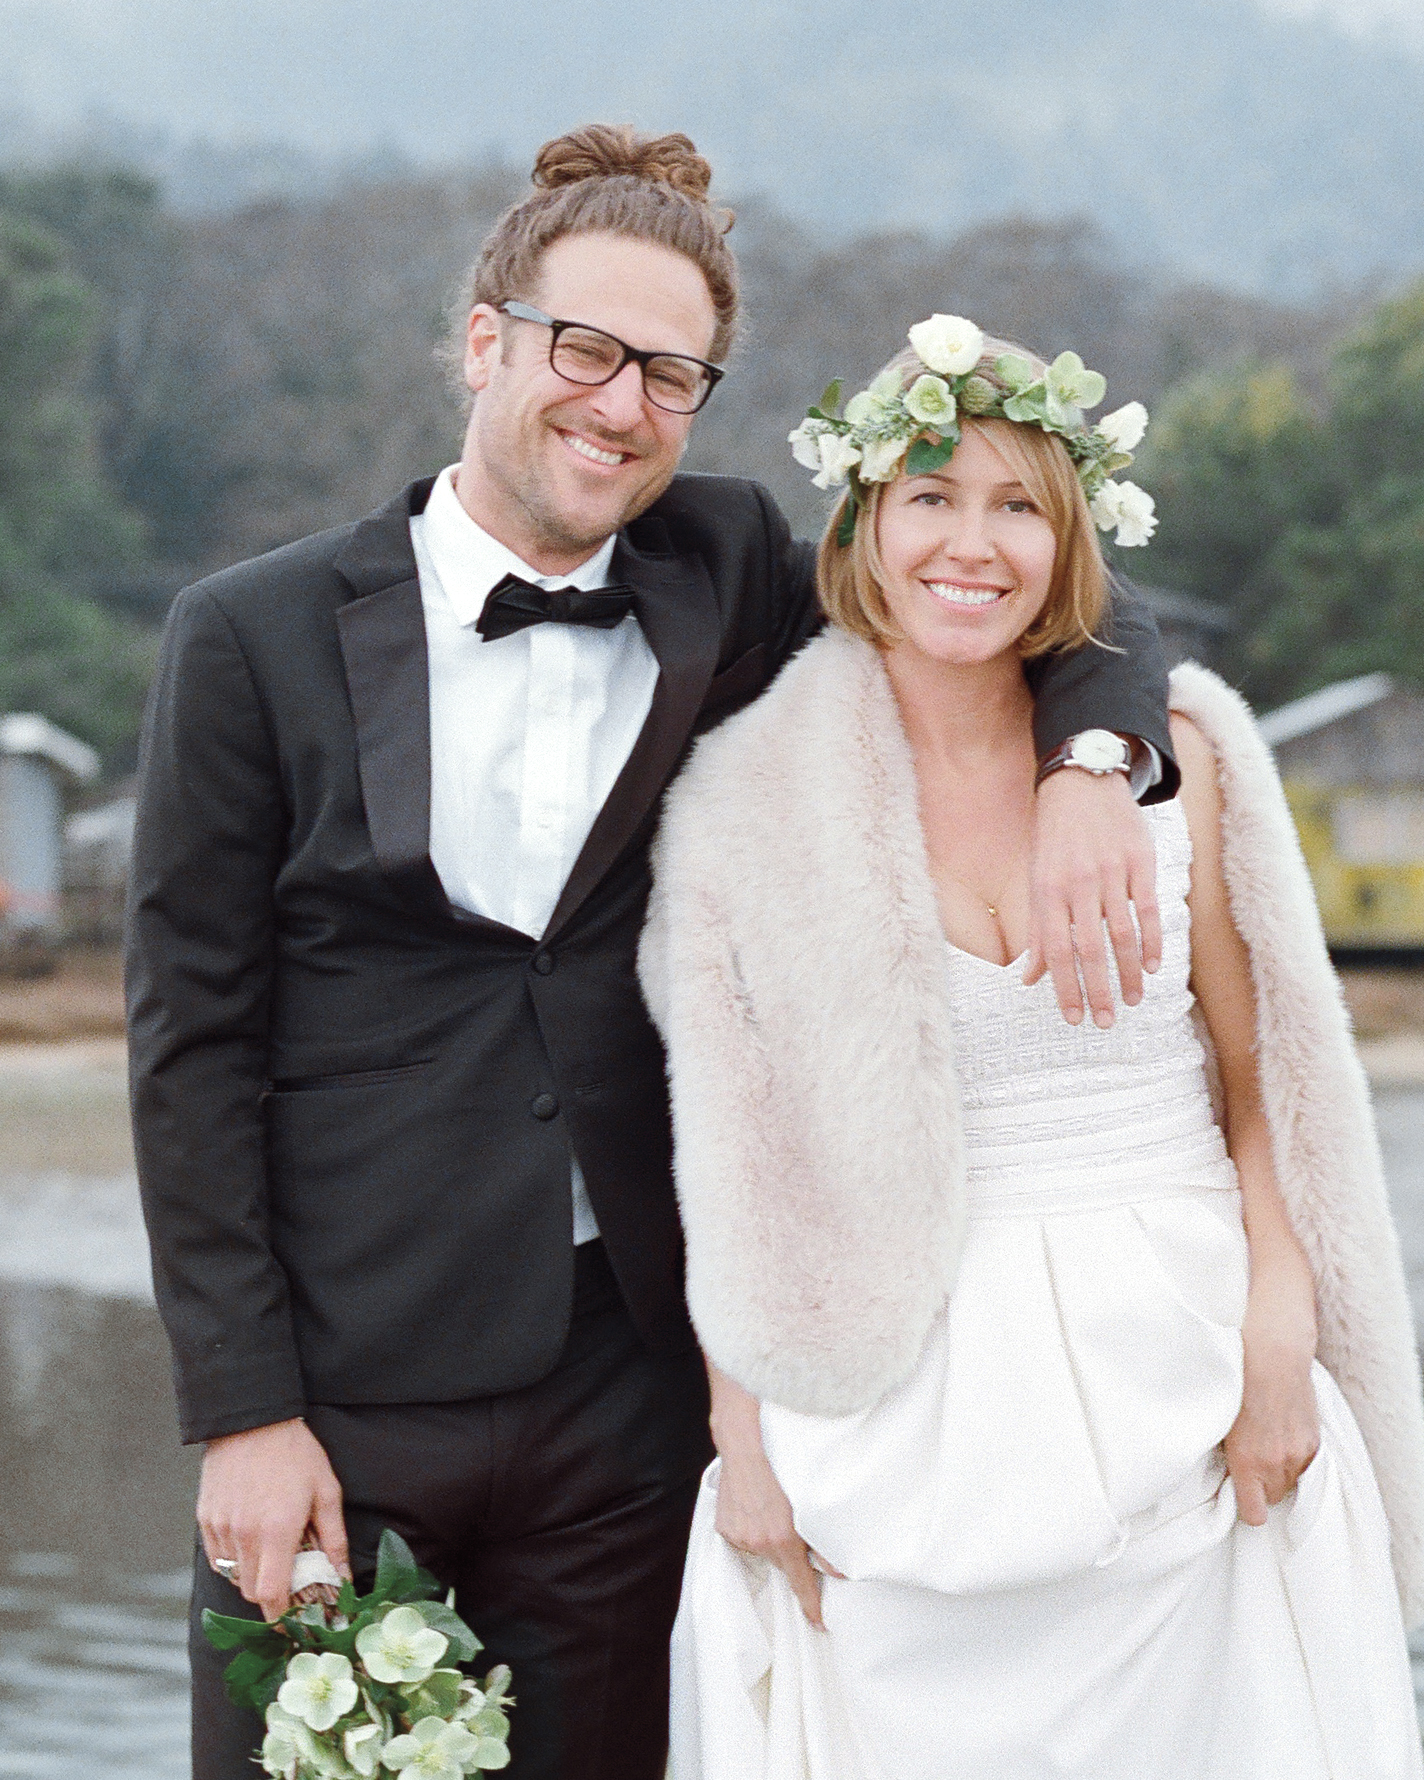 alison-markus-real-wedding-elizabeth-messina-001-ds111251.jpg